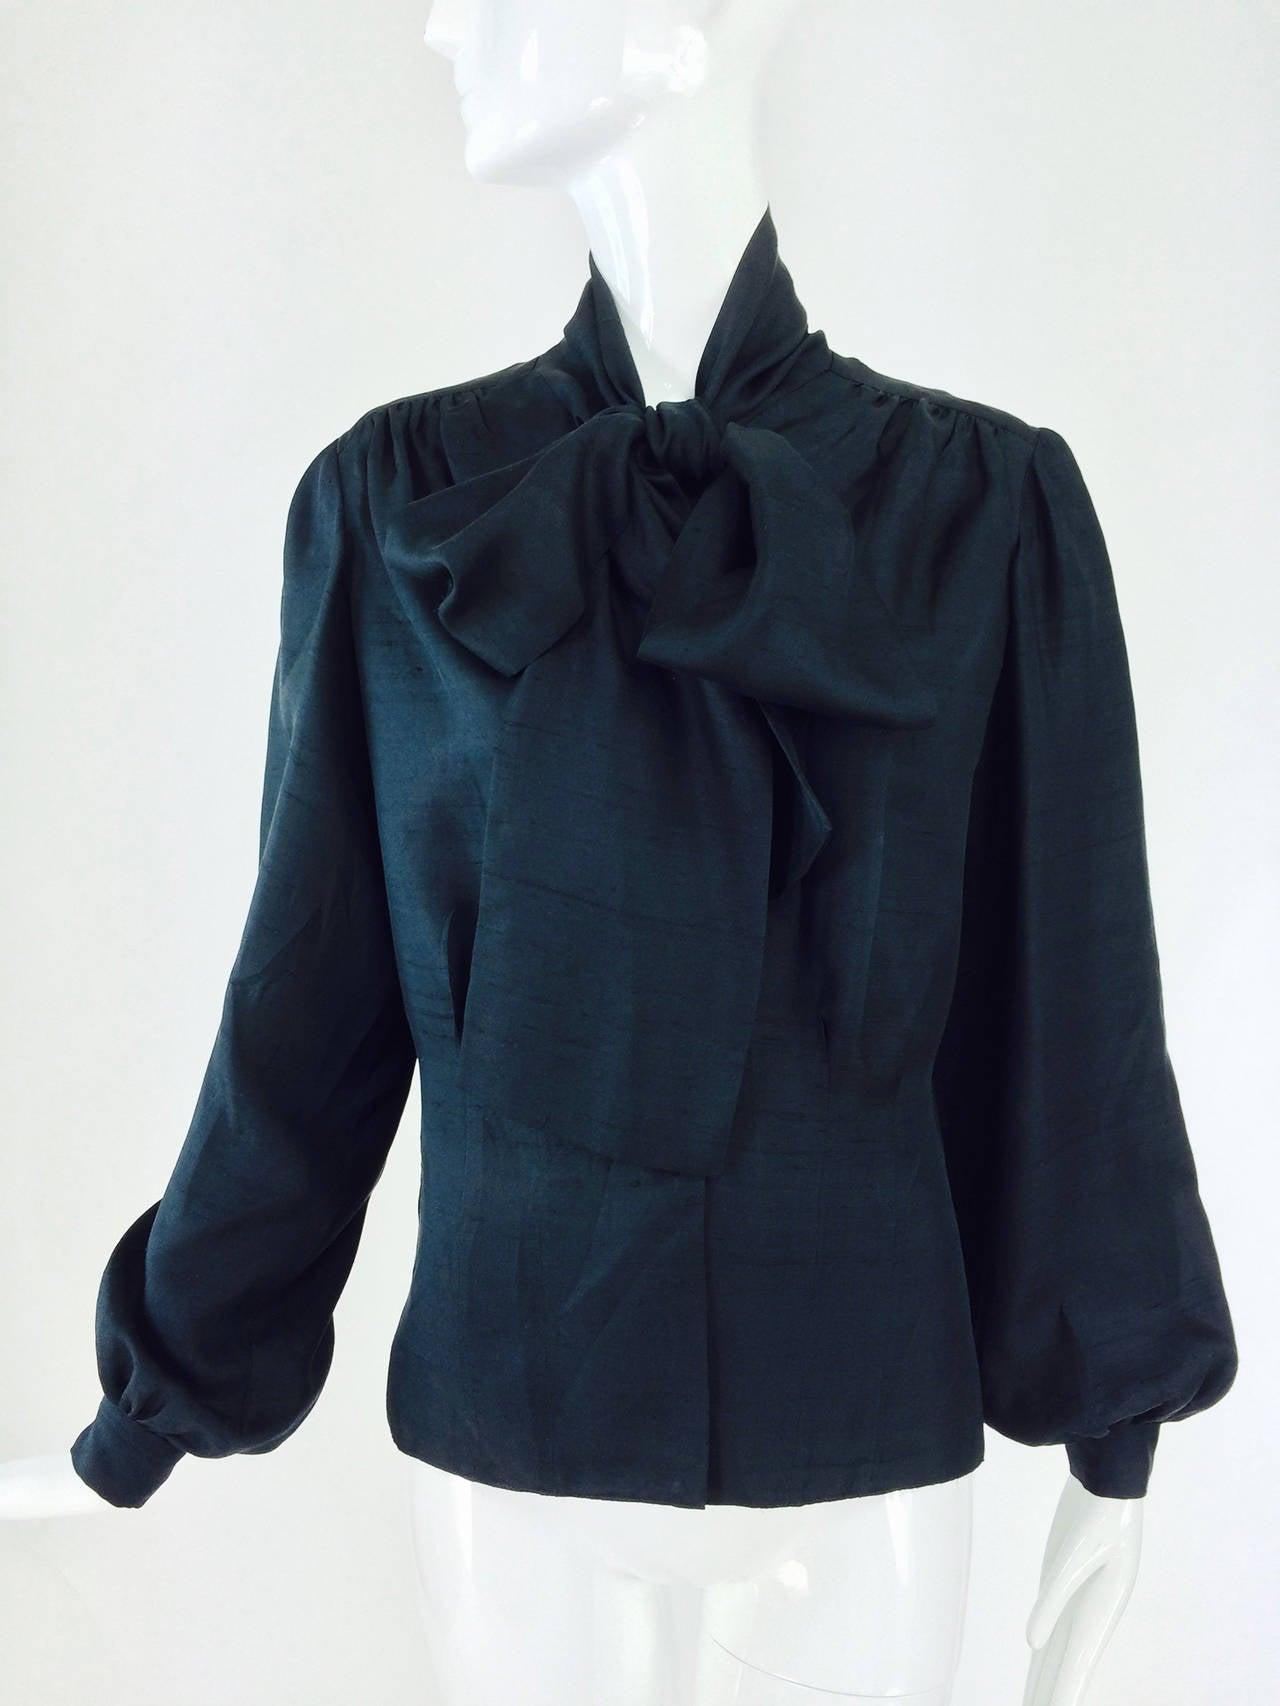 pierre balmain haute couture black pongee silk bow tie